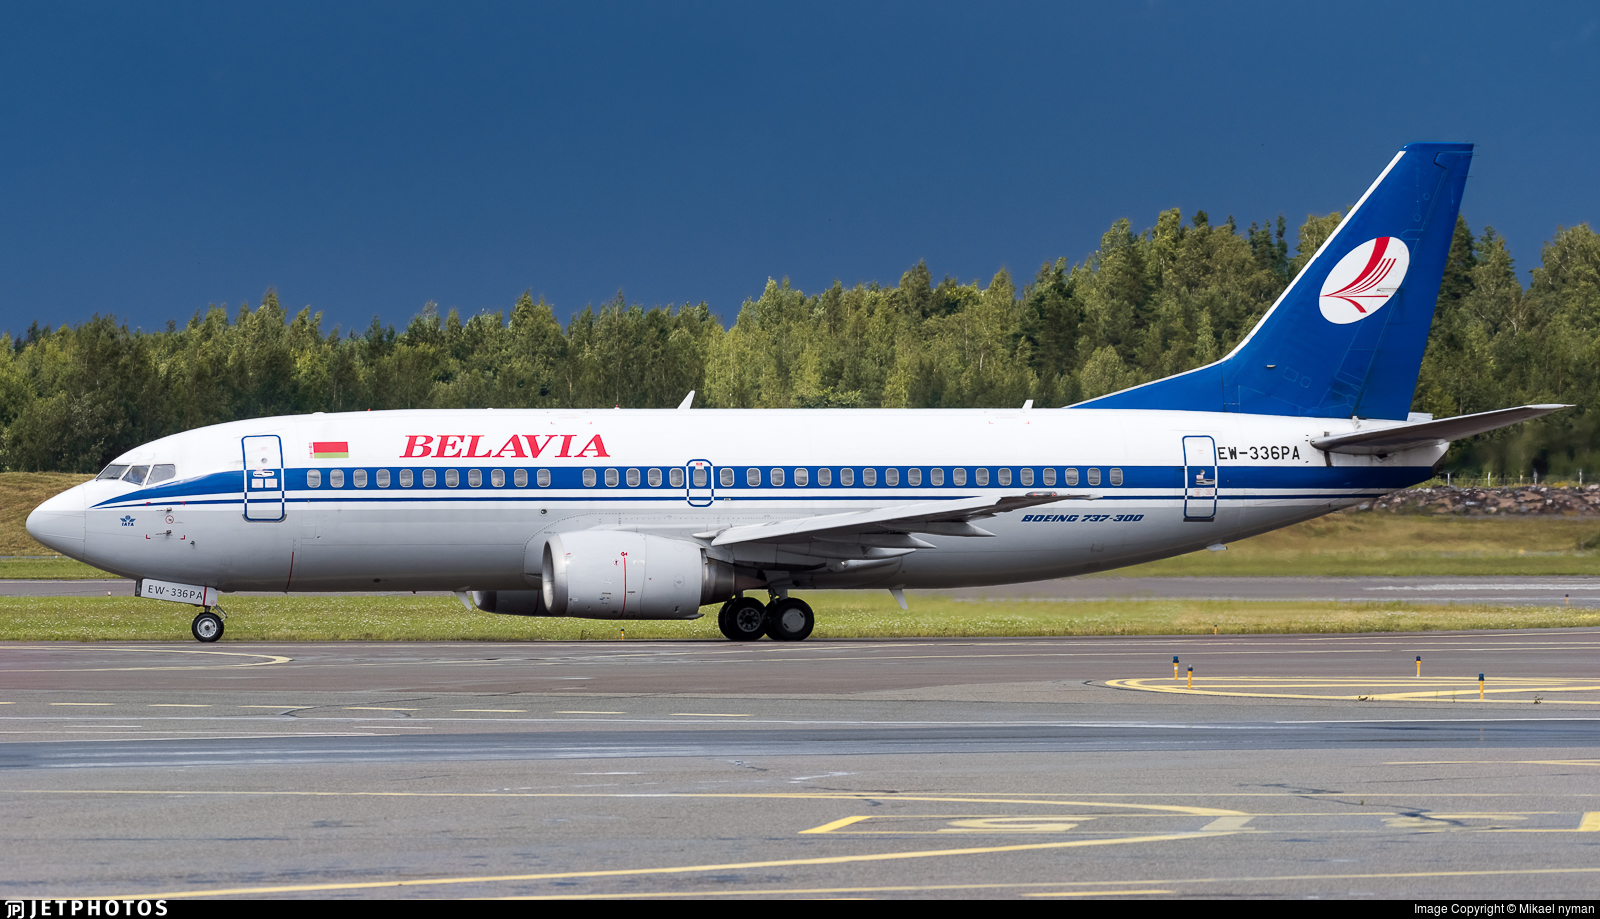 EW-336PA - Boeing 737-3Q8 - Belavia Belarusian Airlines